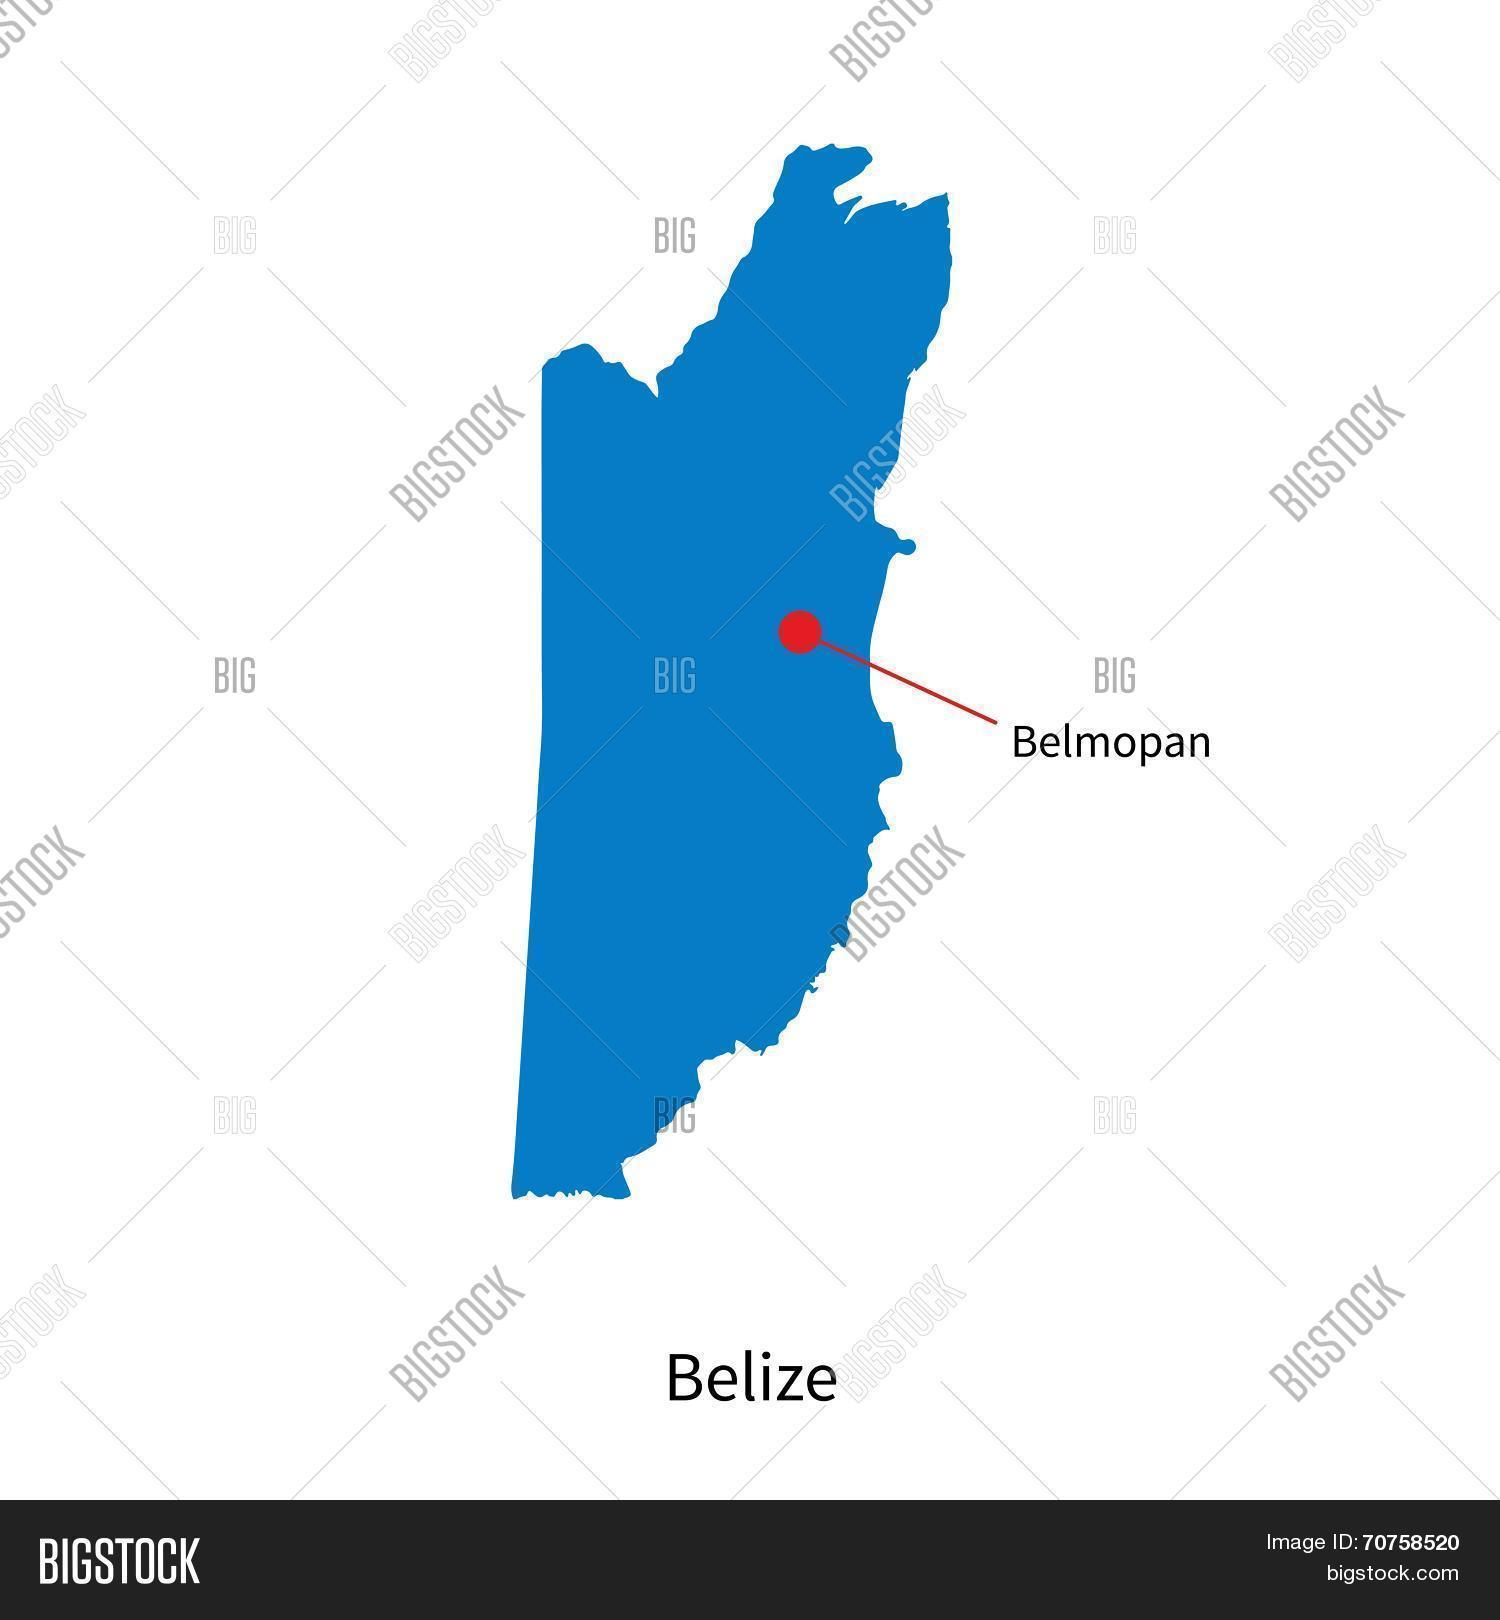 Detailed Vector Map Belize Capital Vector Photo Bigstock - Belize map belmopan